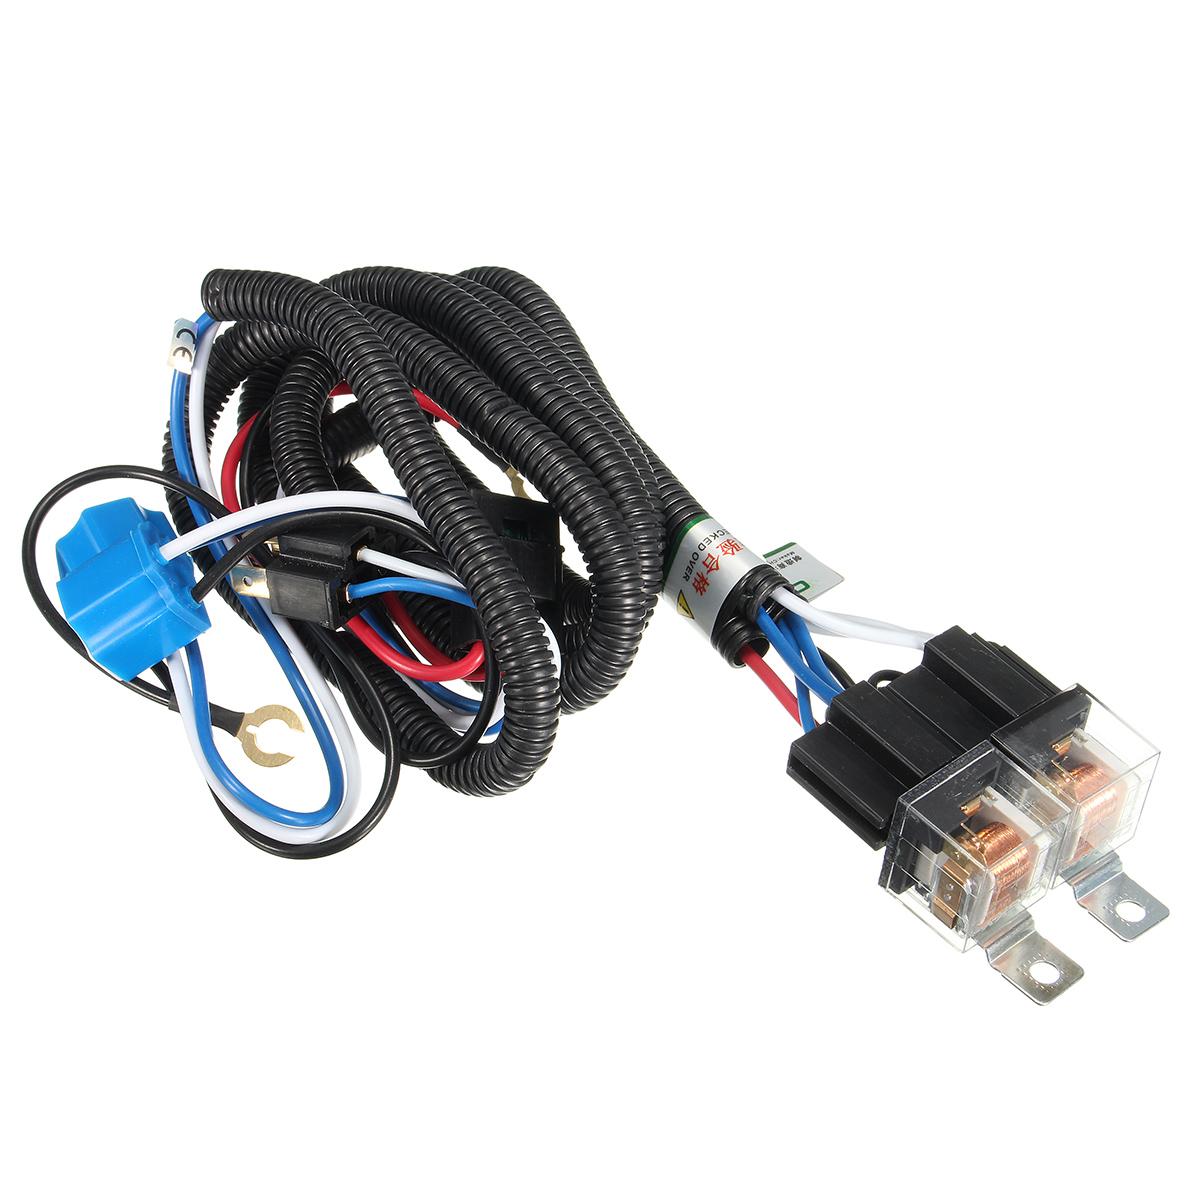 12V 7inch H4 Headlight 2 Headlamp Relay Wiring Ha